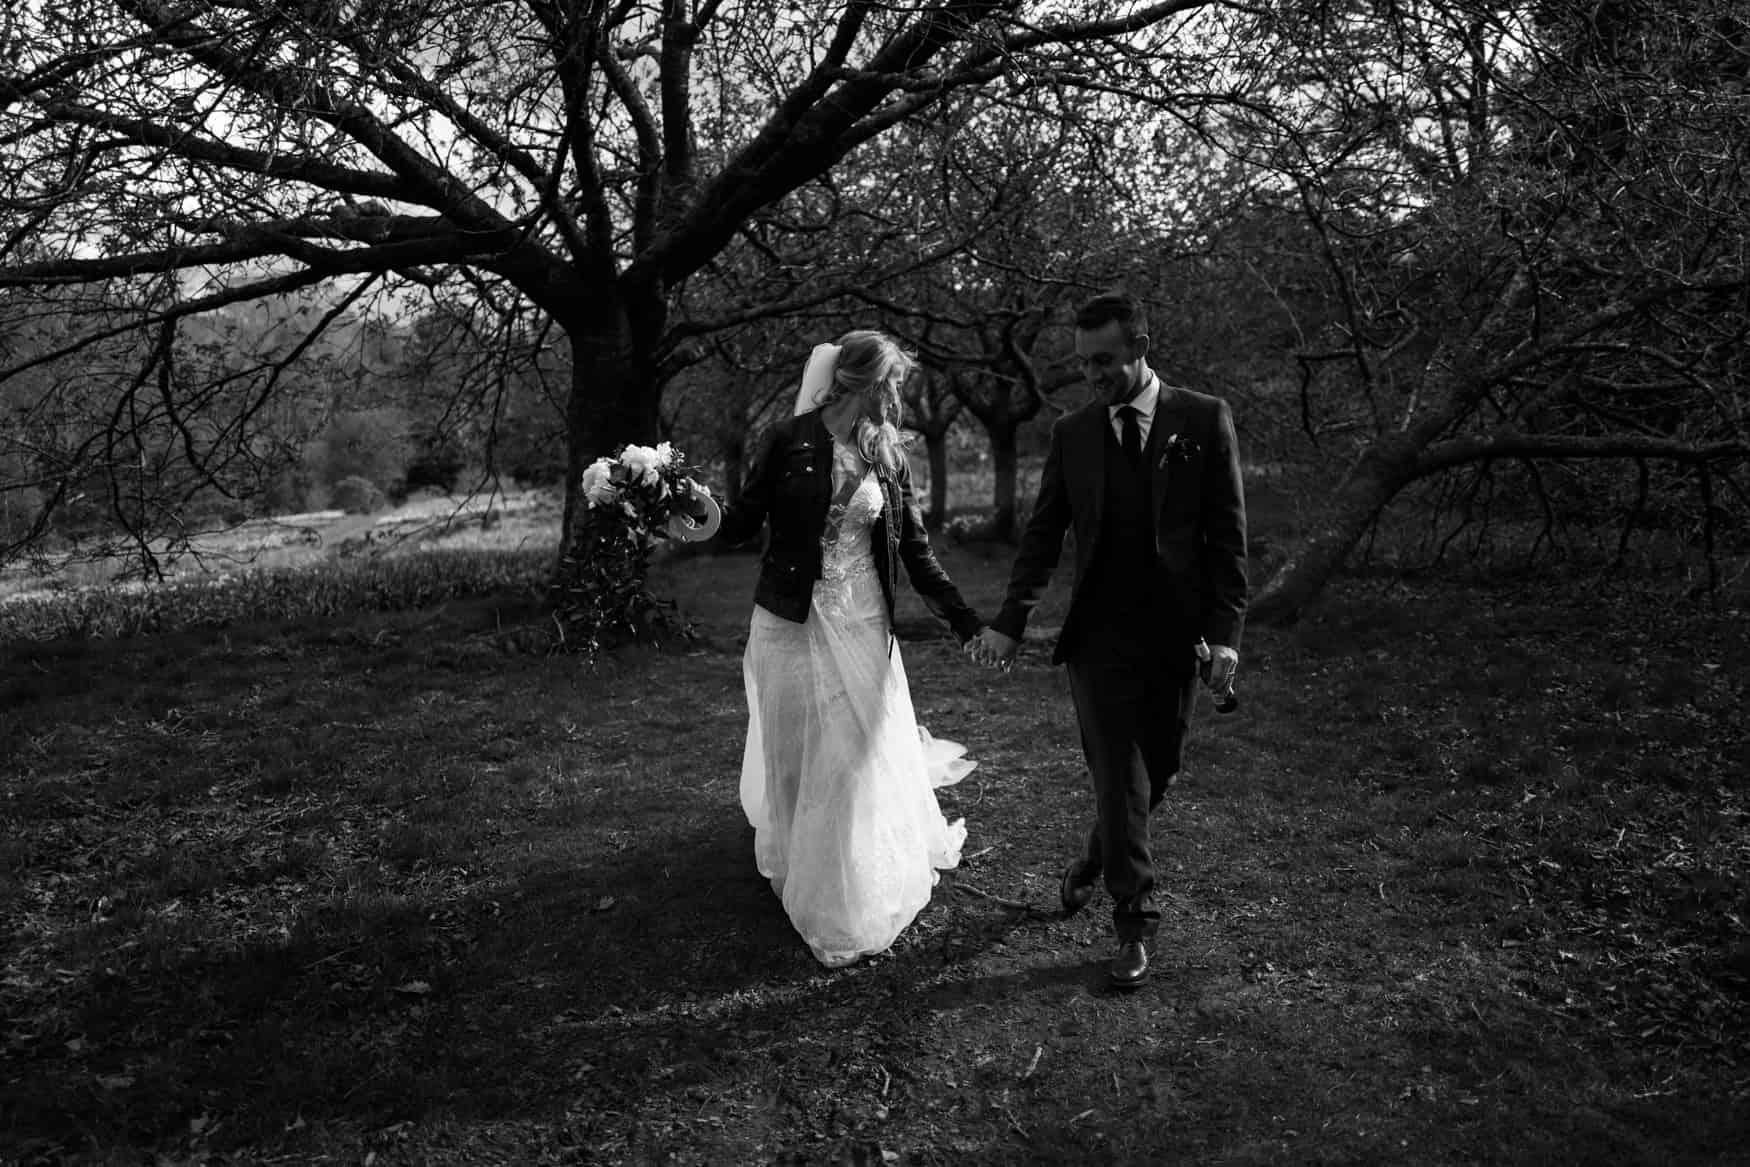 bride and groom walking in a field